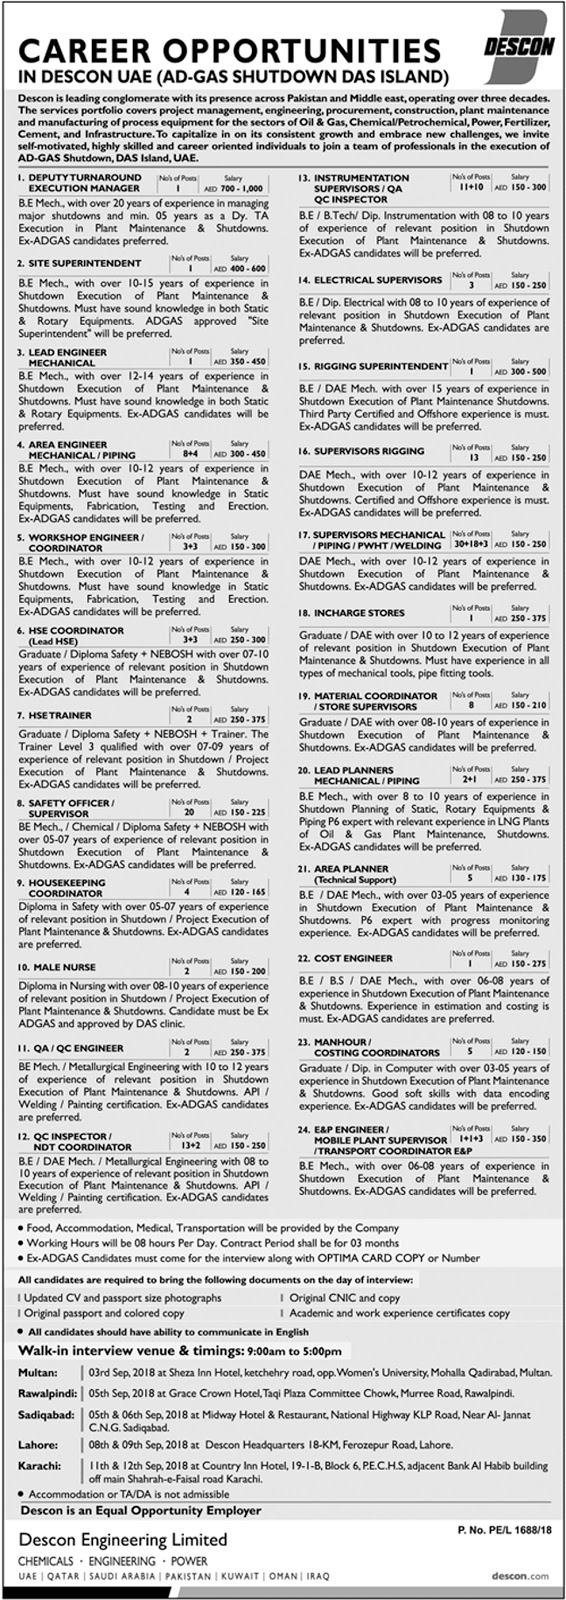 Descon Engineering Limited (SHUTDOWN) United Arab Emirates Jobs